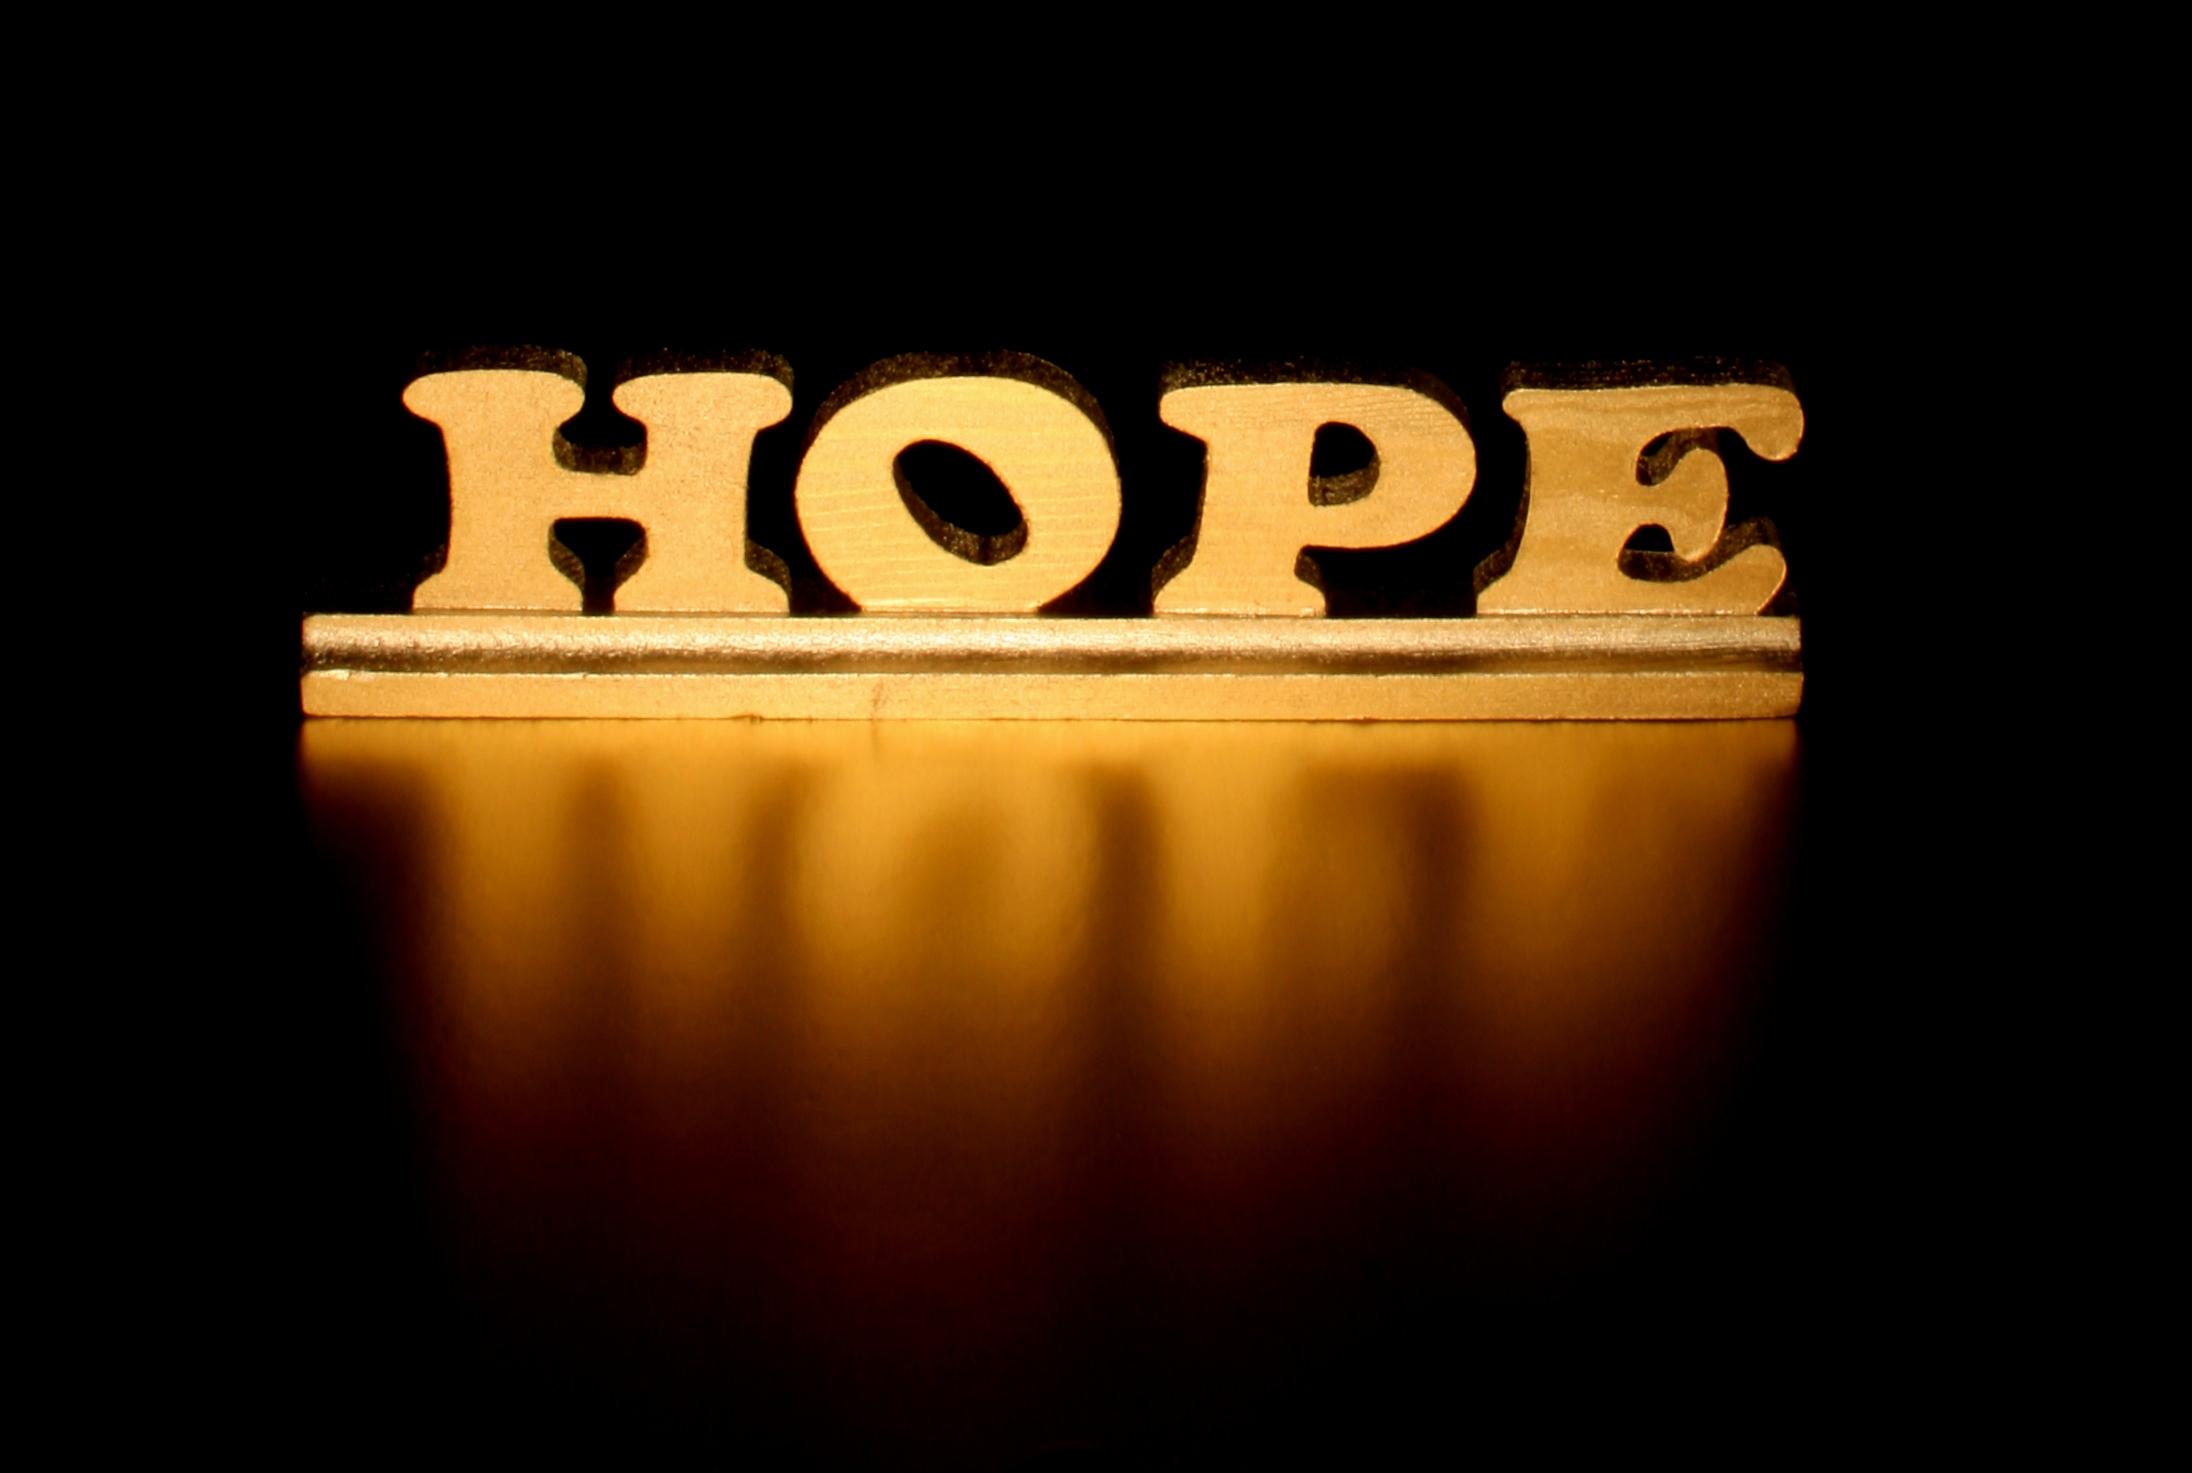 hope12_1392061758.jpg_2192x1473